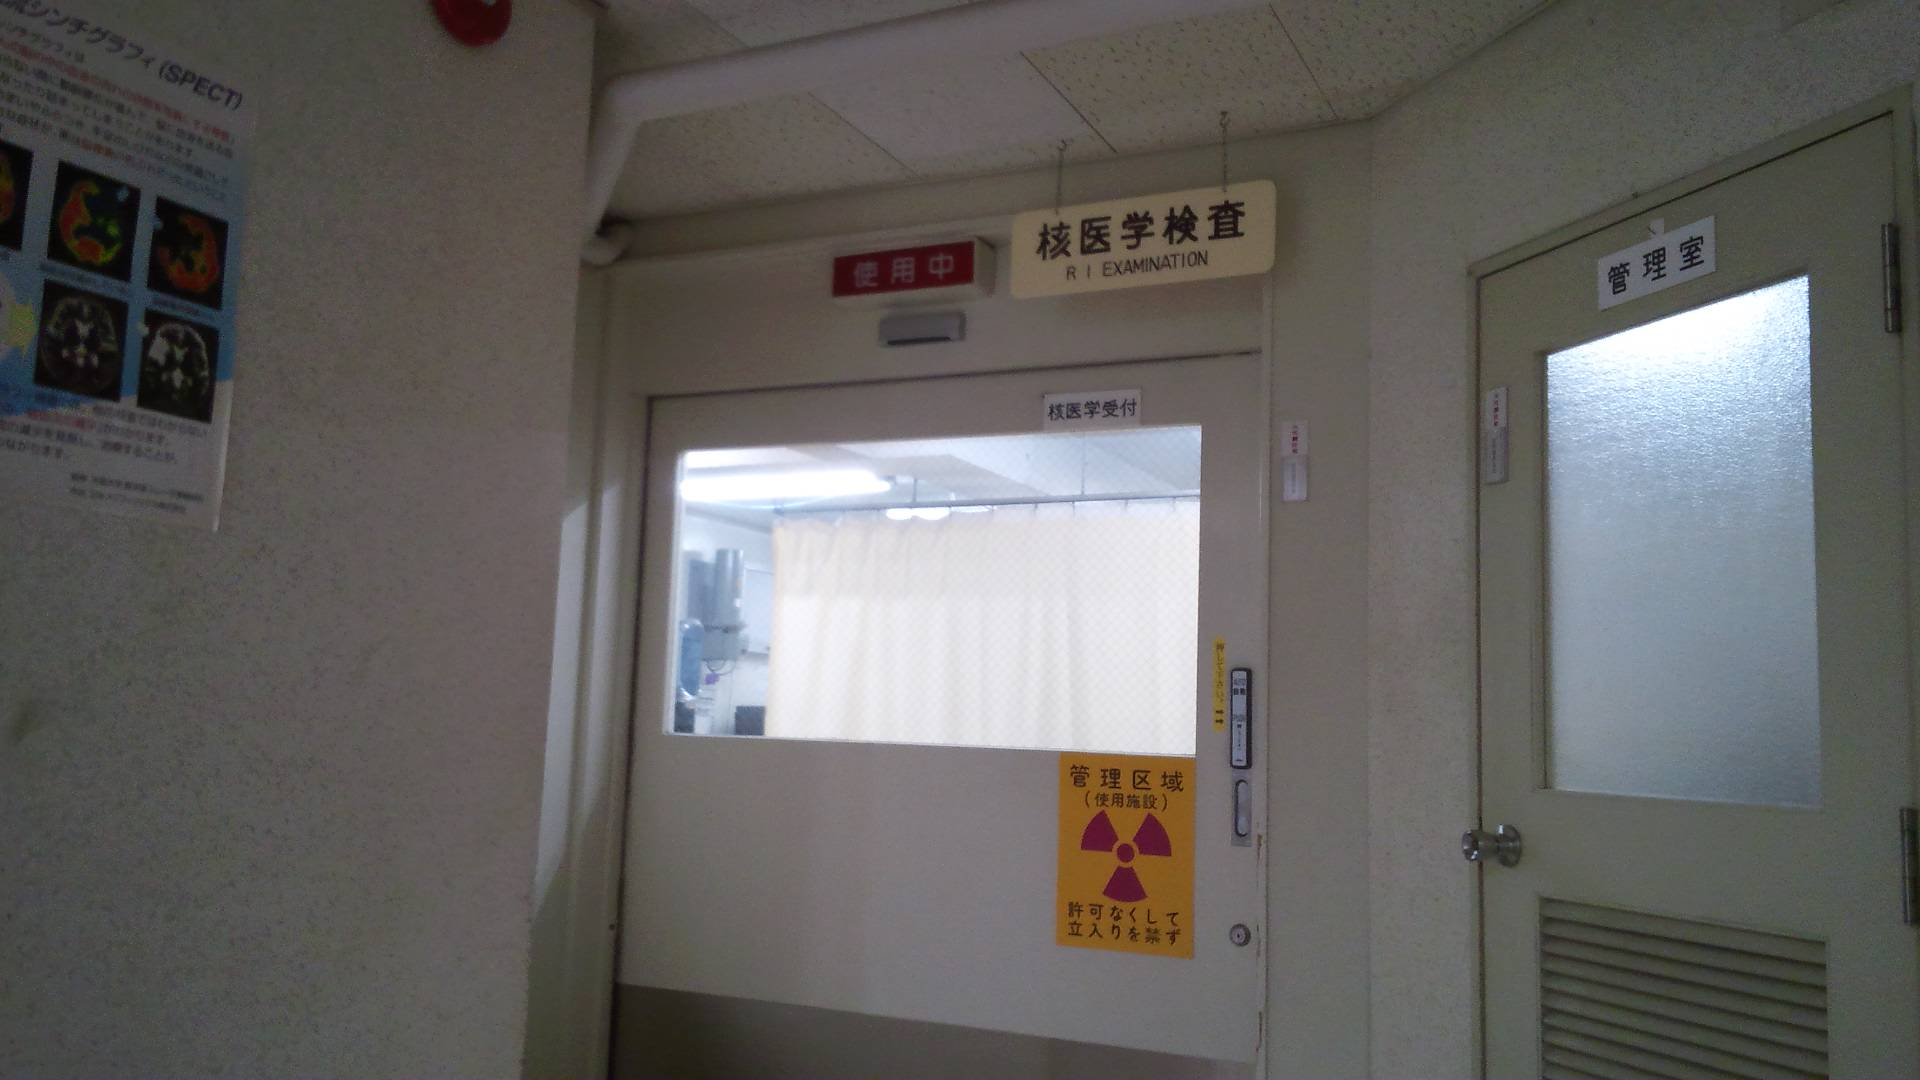 RI(核医学)検査 - ncc.go.jp